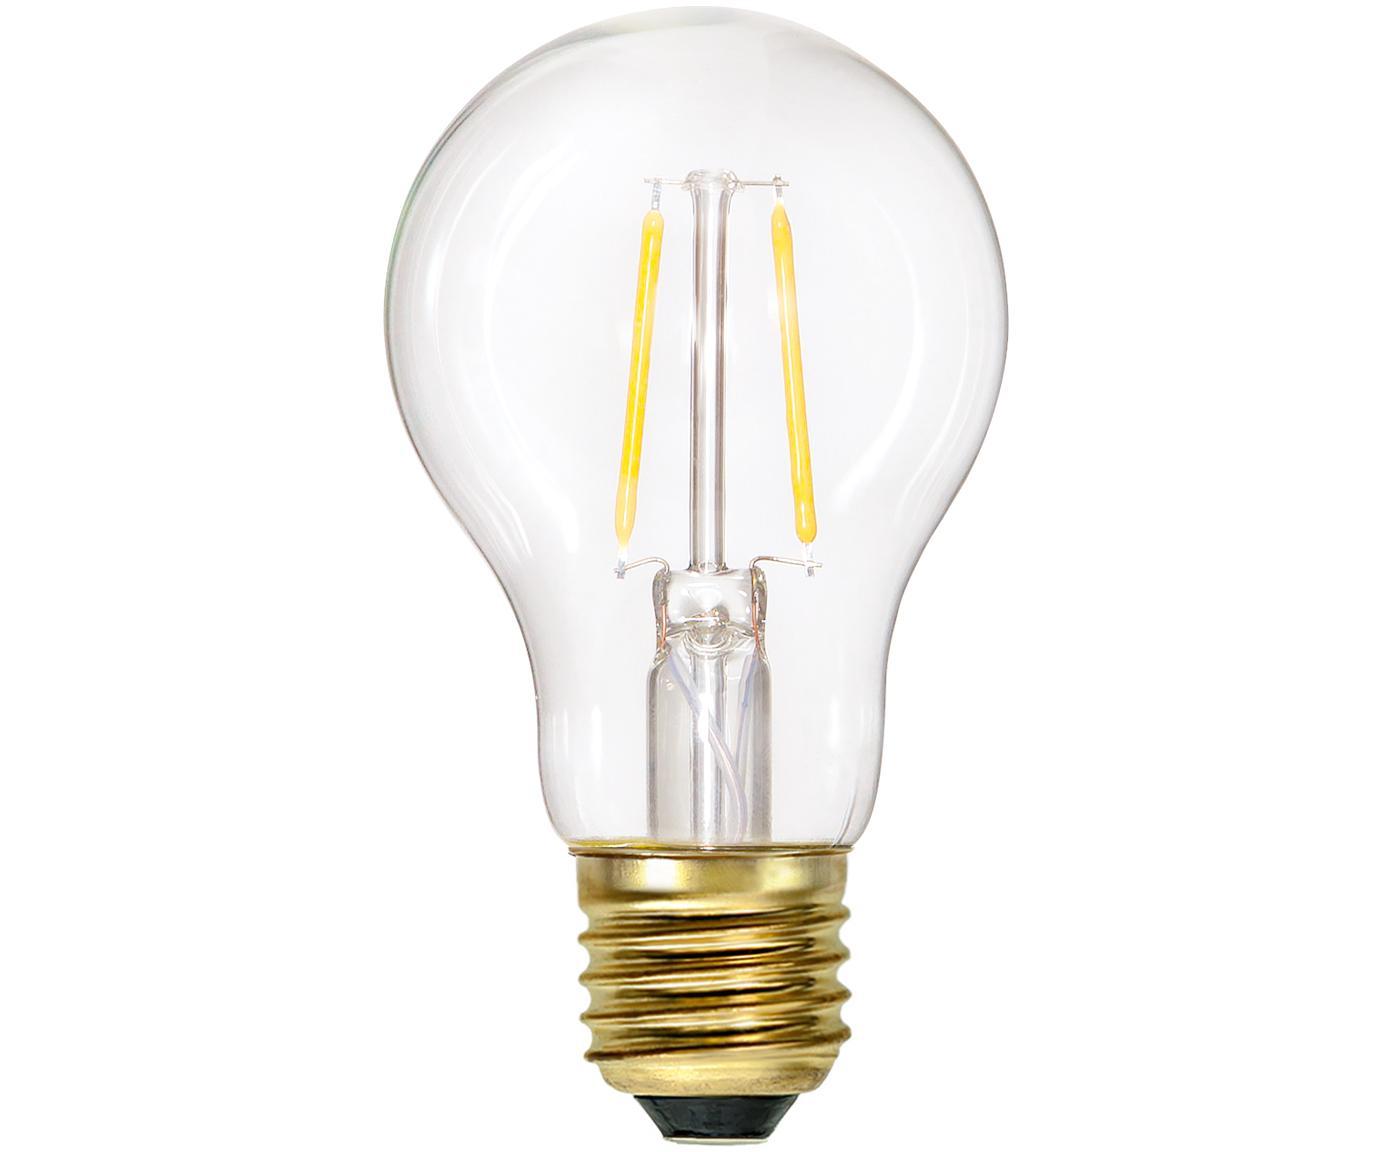 Bombilla LED Airtight Stream (E27/1,6W), Ampolla: vidrio, Casquillo: latón, Transparente, latón, Ø 6 x Al 11 cm